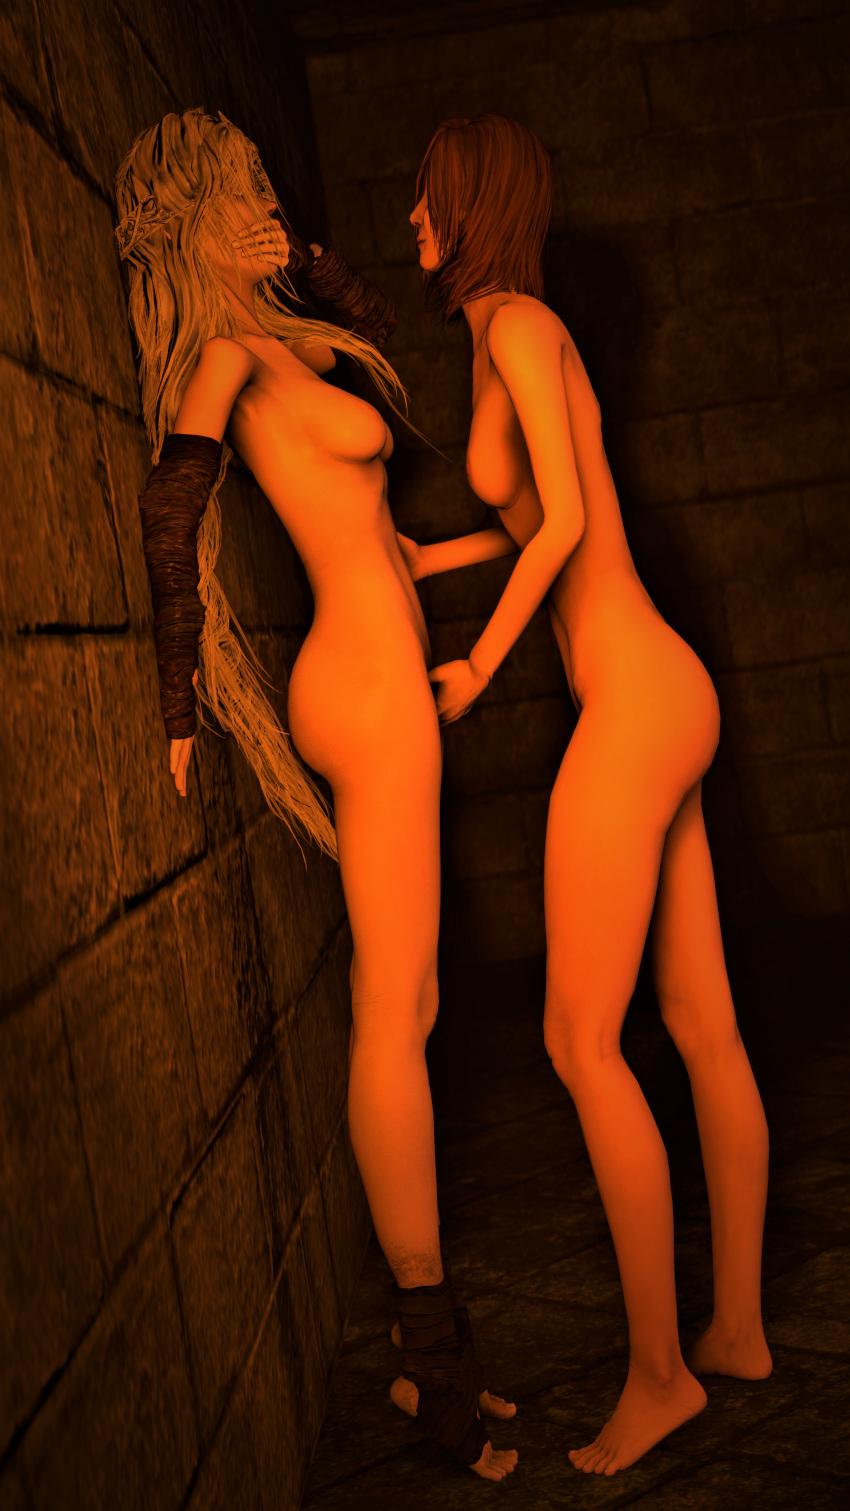 souls dark of thorolund rhea League of legends kindred gif